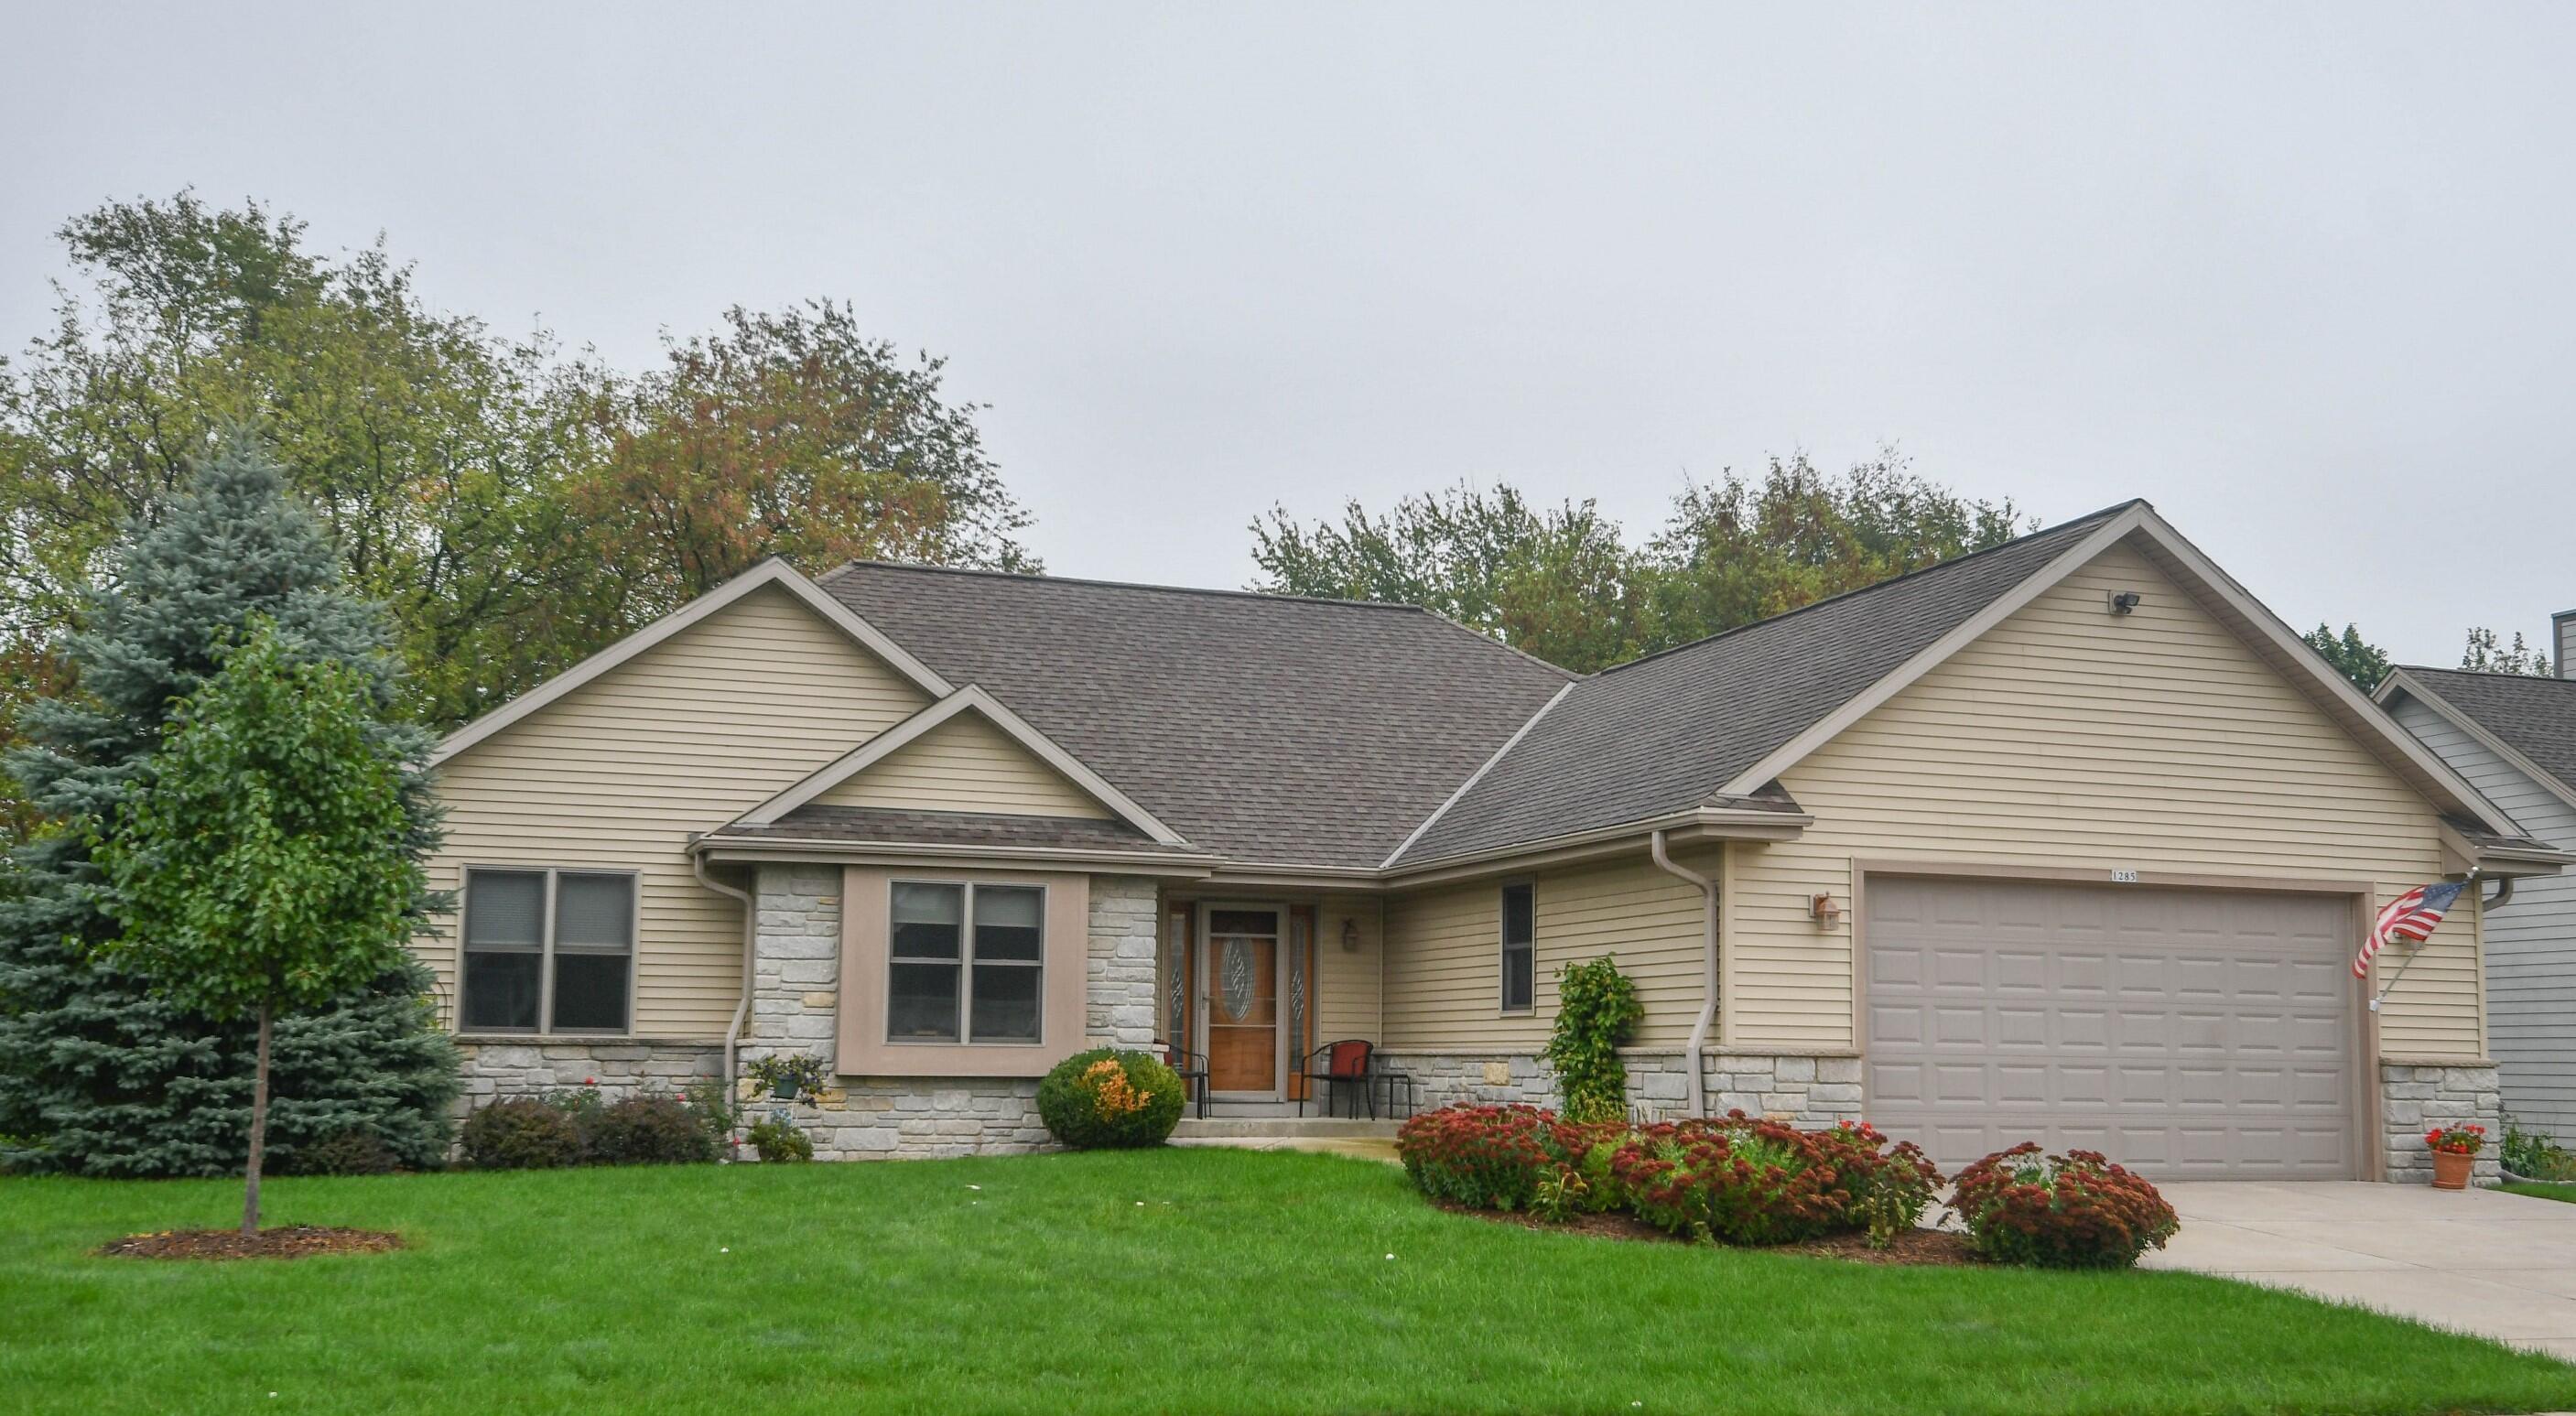 1285 Niagara Rd, Oconomowoc, Wisconsin 53066, 3 Bedrooms Bedrooms, 7 Rooms Rooms,2 BathroomsBathrooms,Single-Family,For Sale,Niagara Rd,1768080